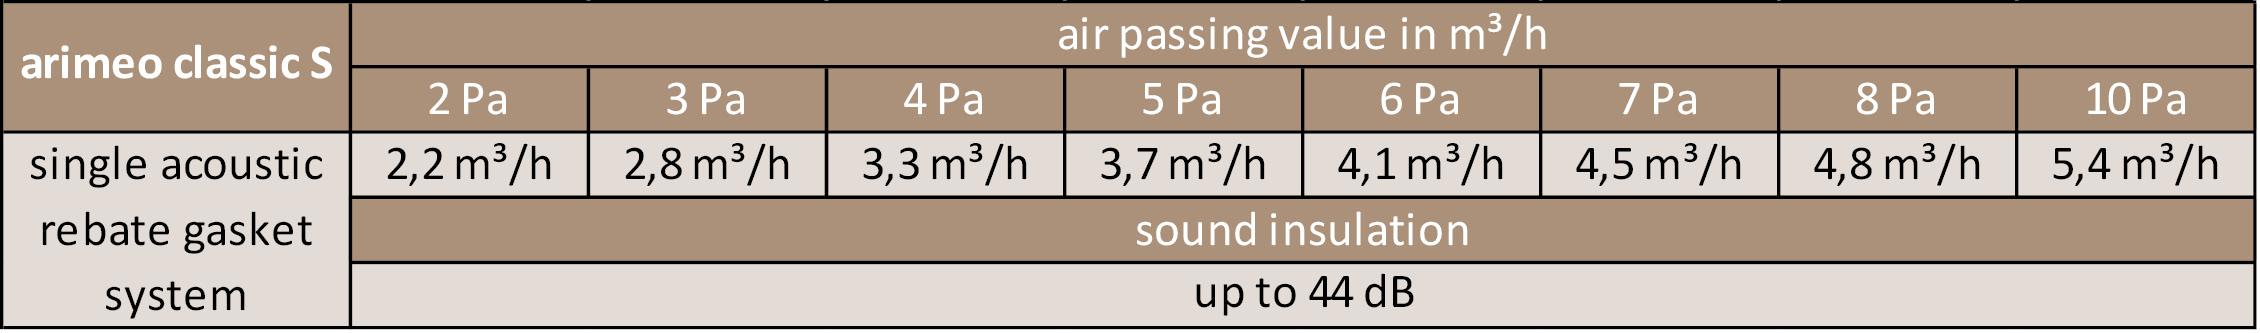 arimeo classic S performance data single acoustic